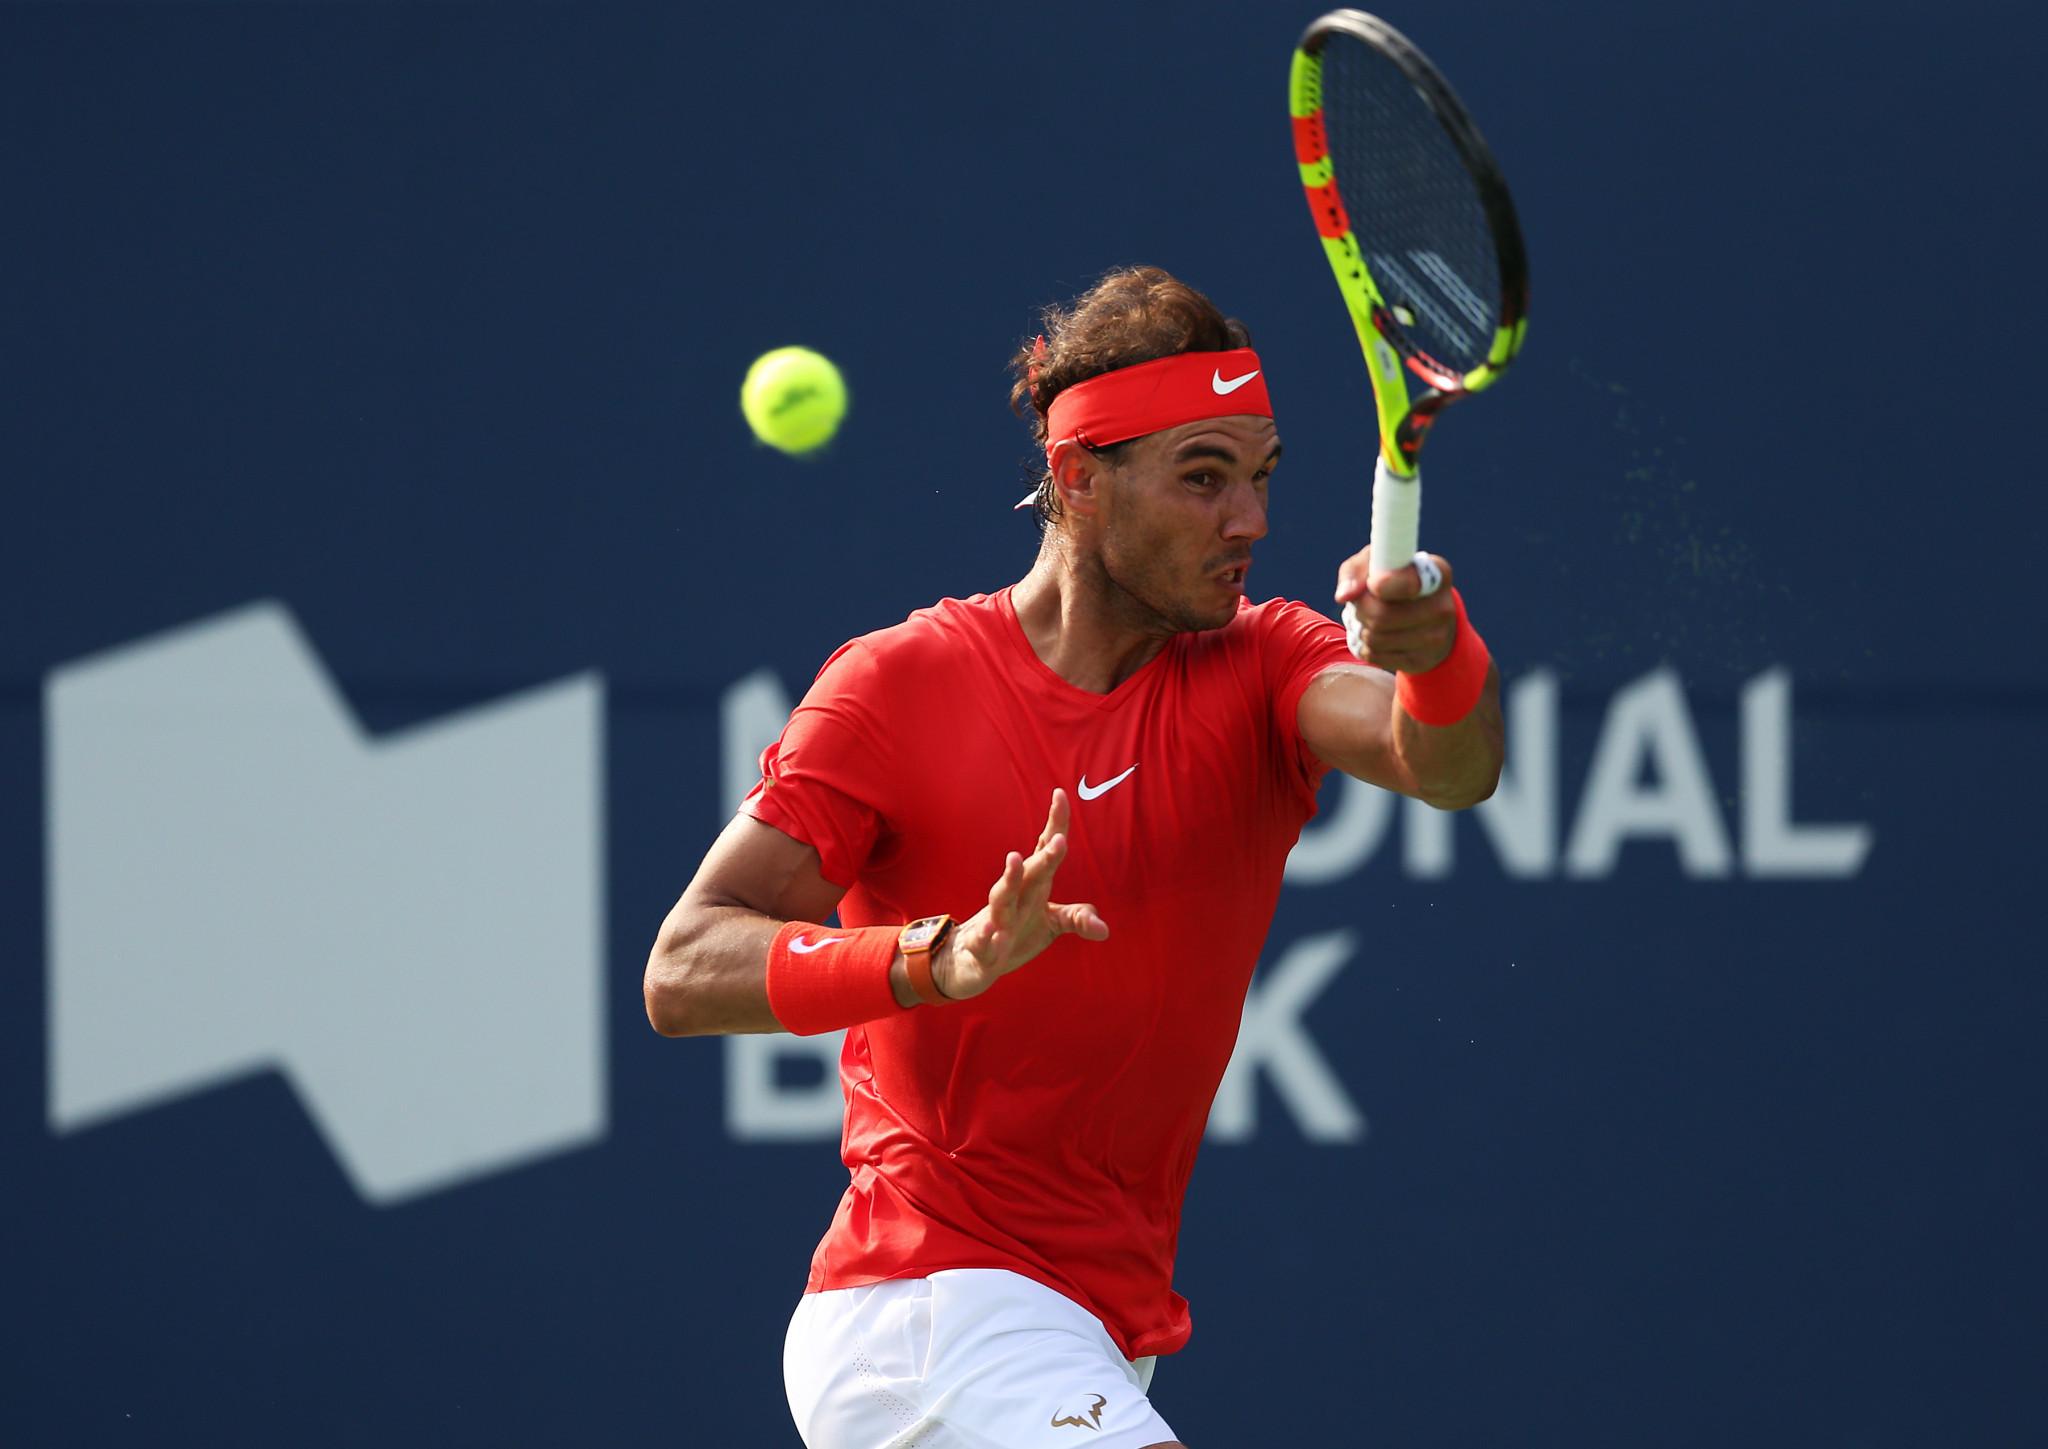 Nadal ends birthday boy Tsitsipas' winning run to claim Rogers Cup title